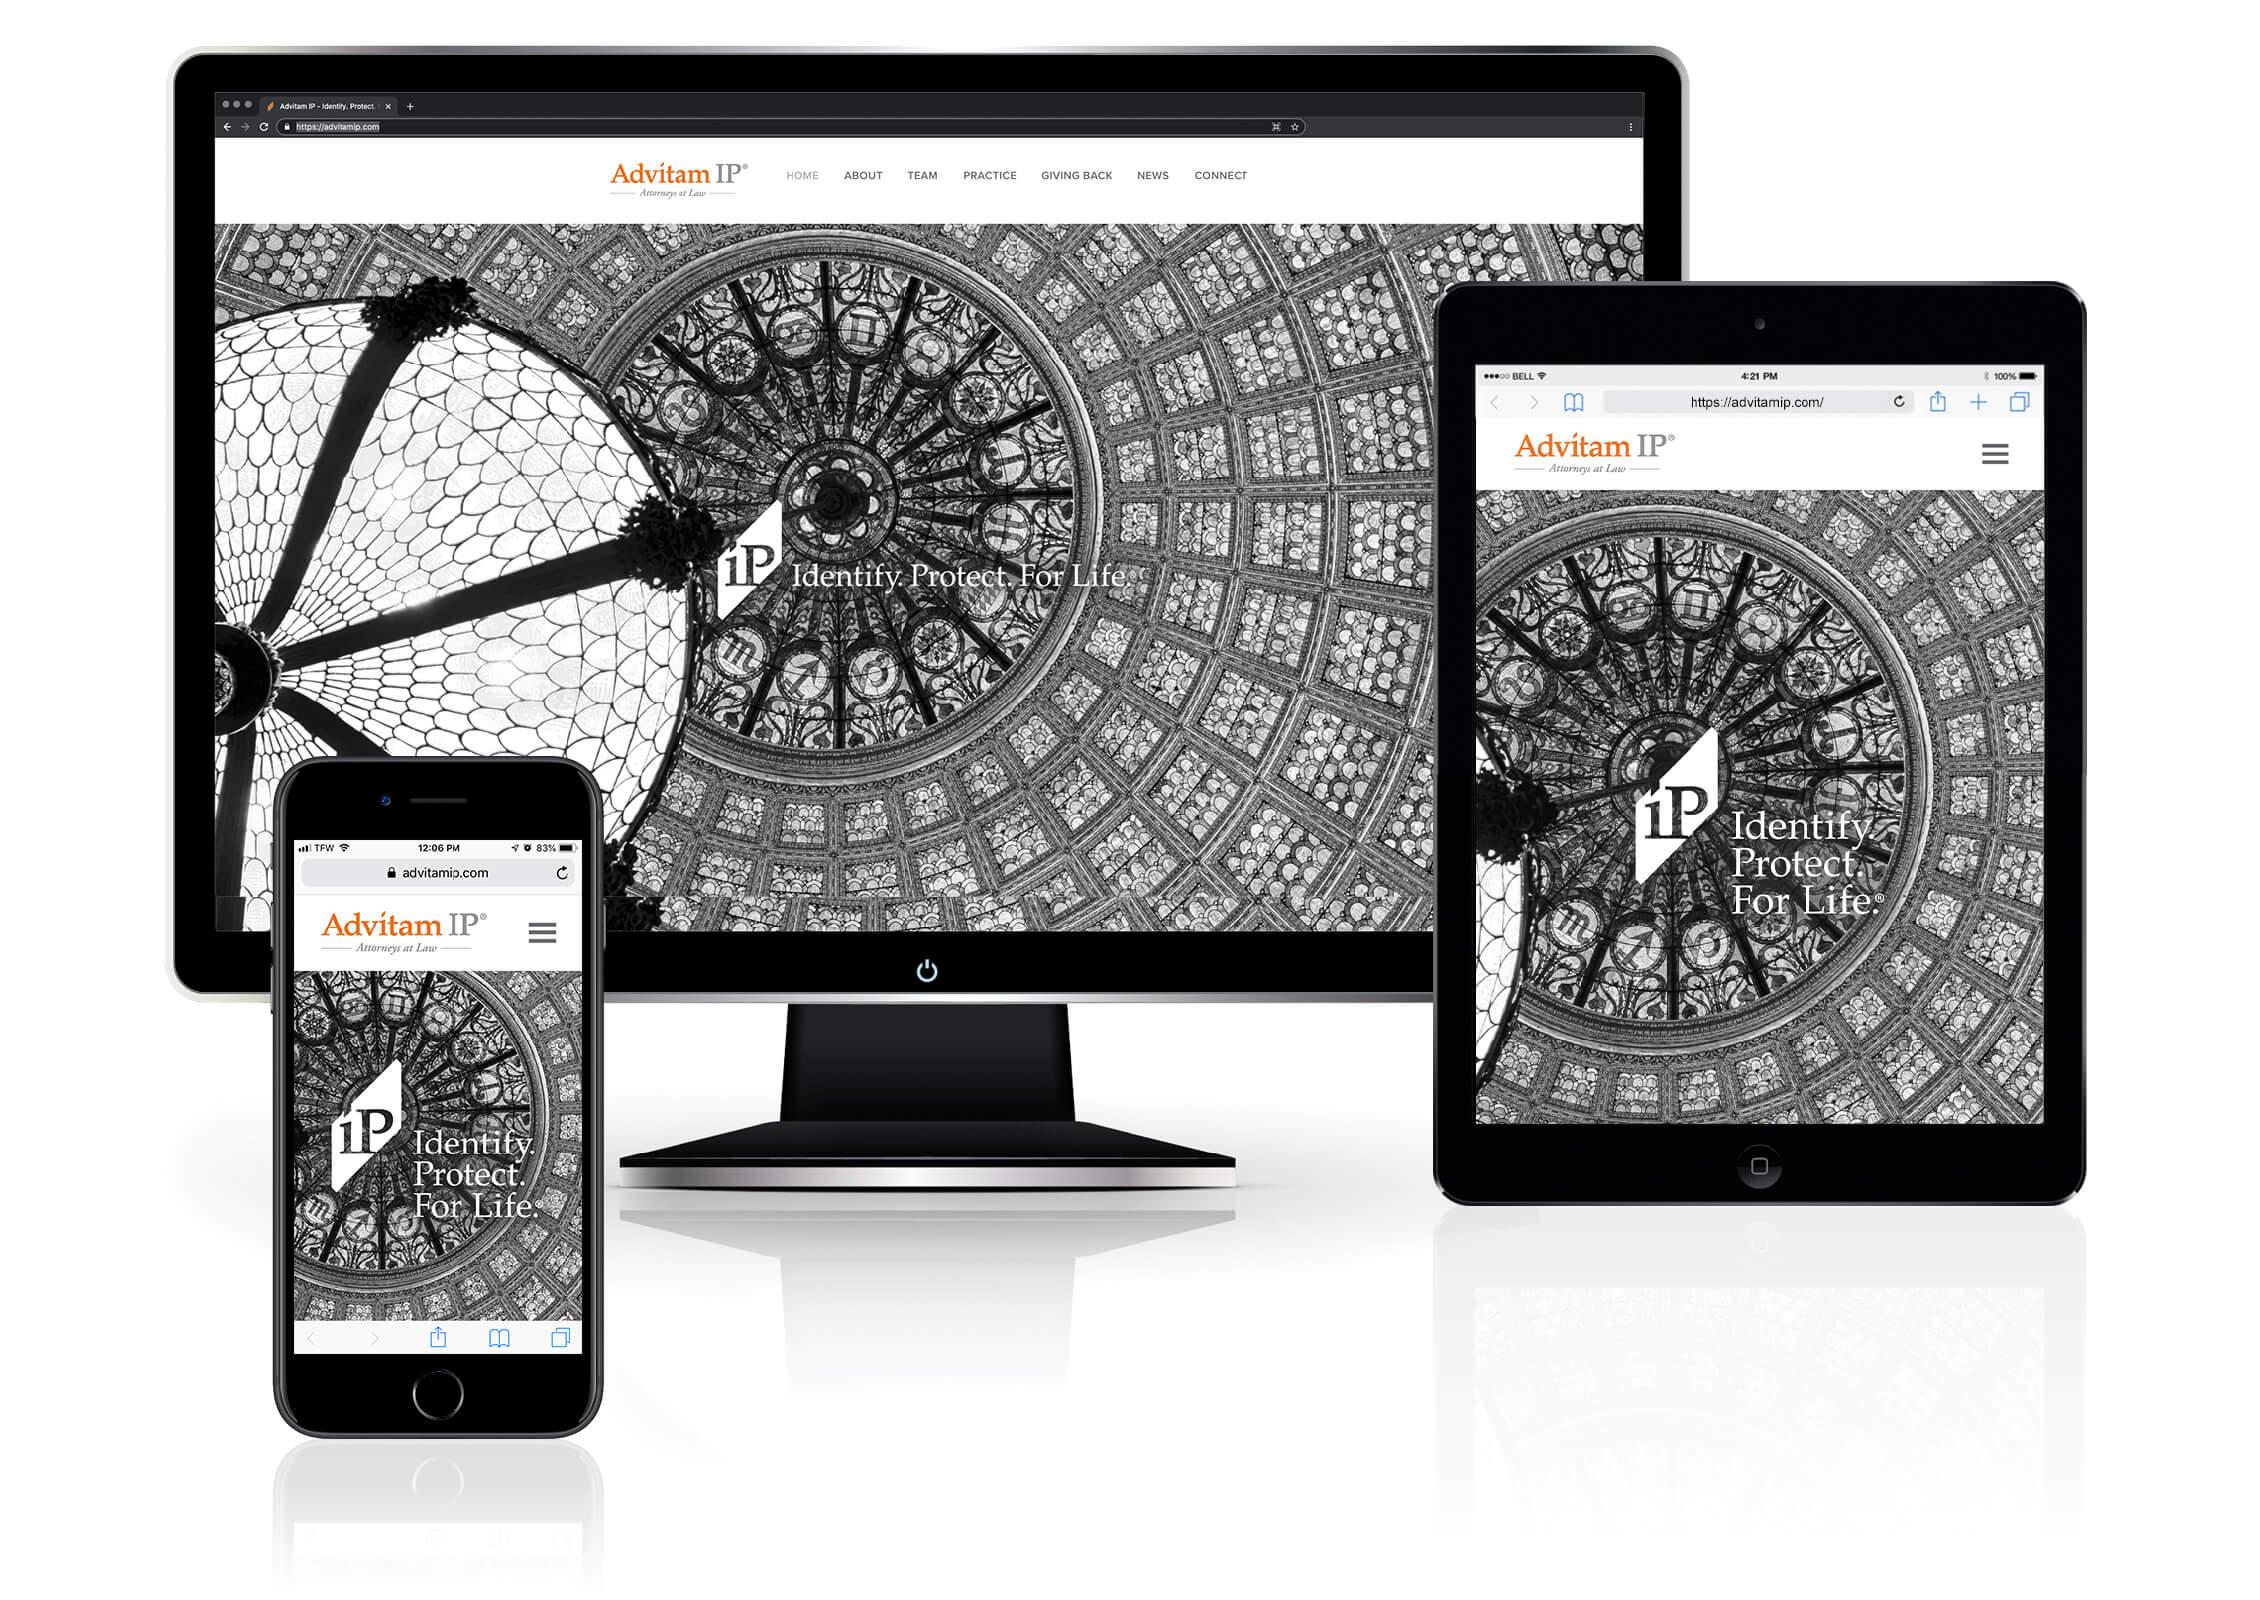 Multiple devices showcasing Advitam IP's Responsive website design